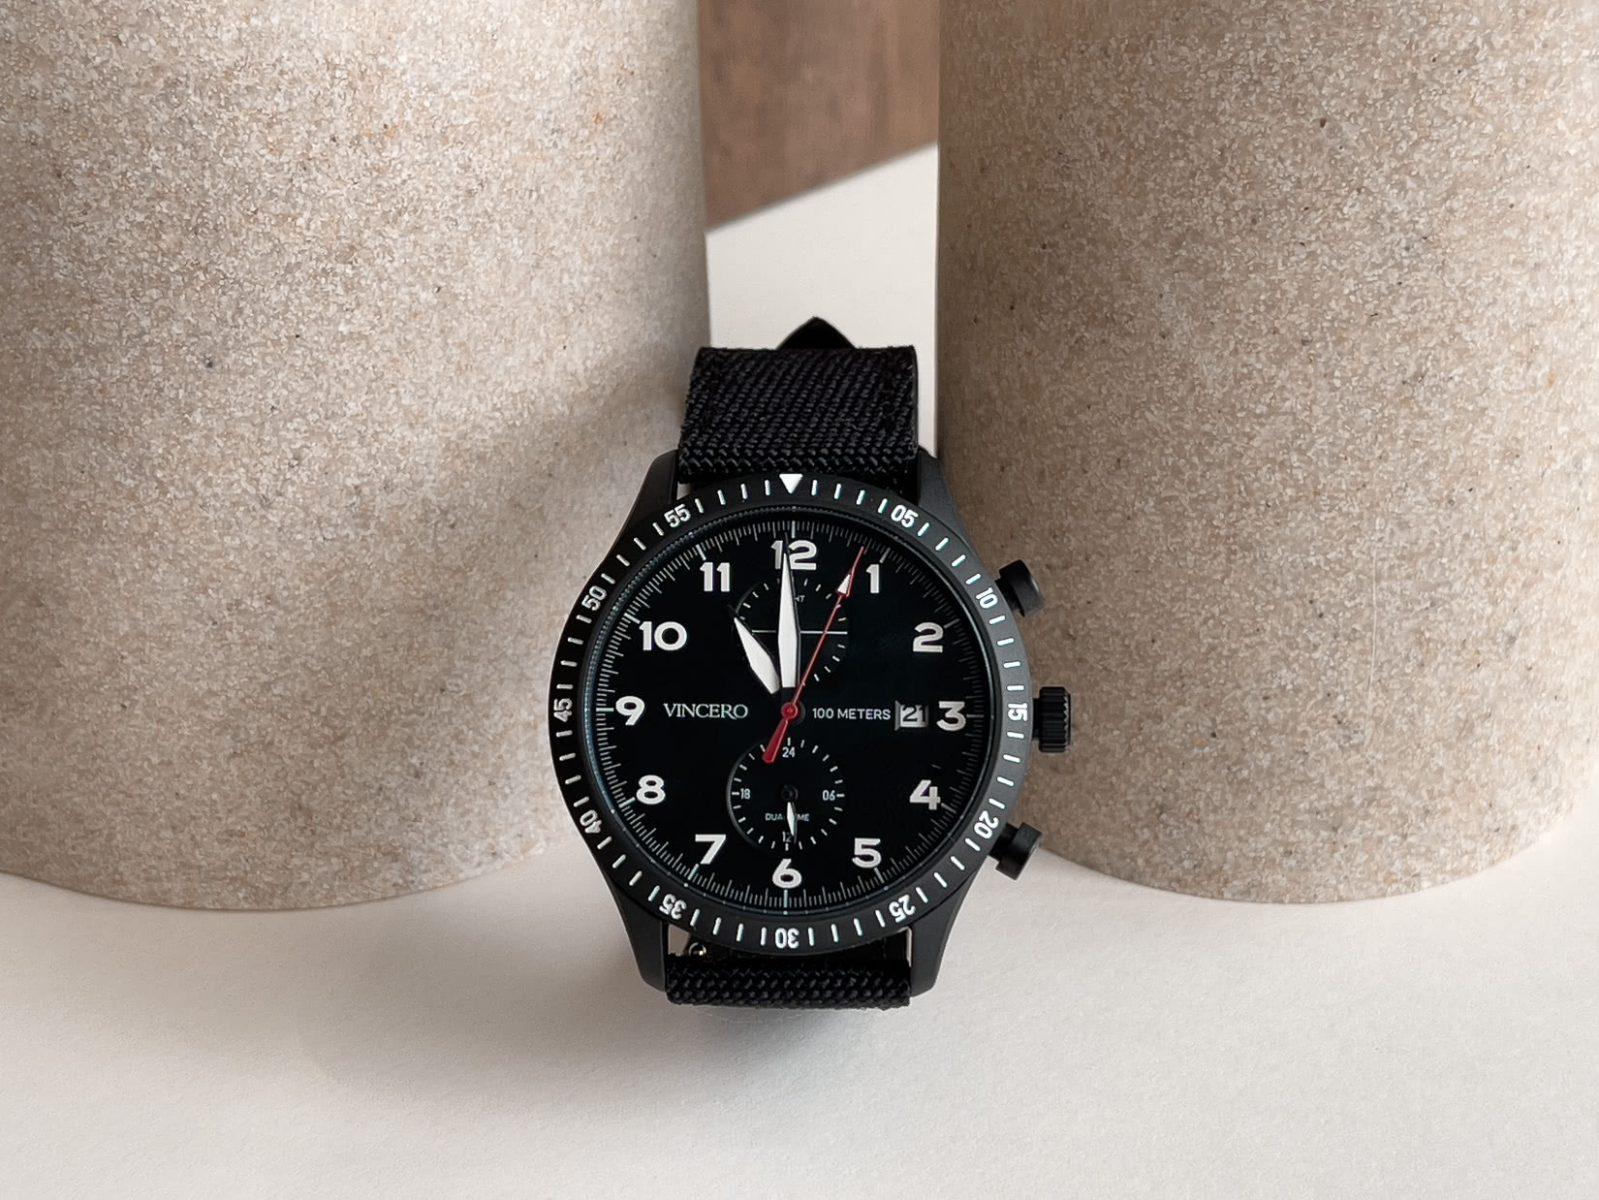 Vincero altitude watch review - Luxe Digital